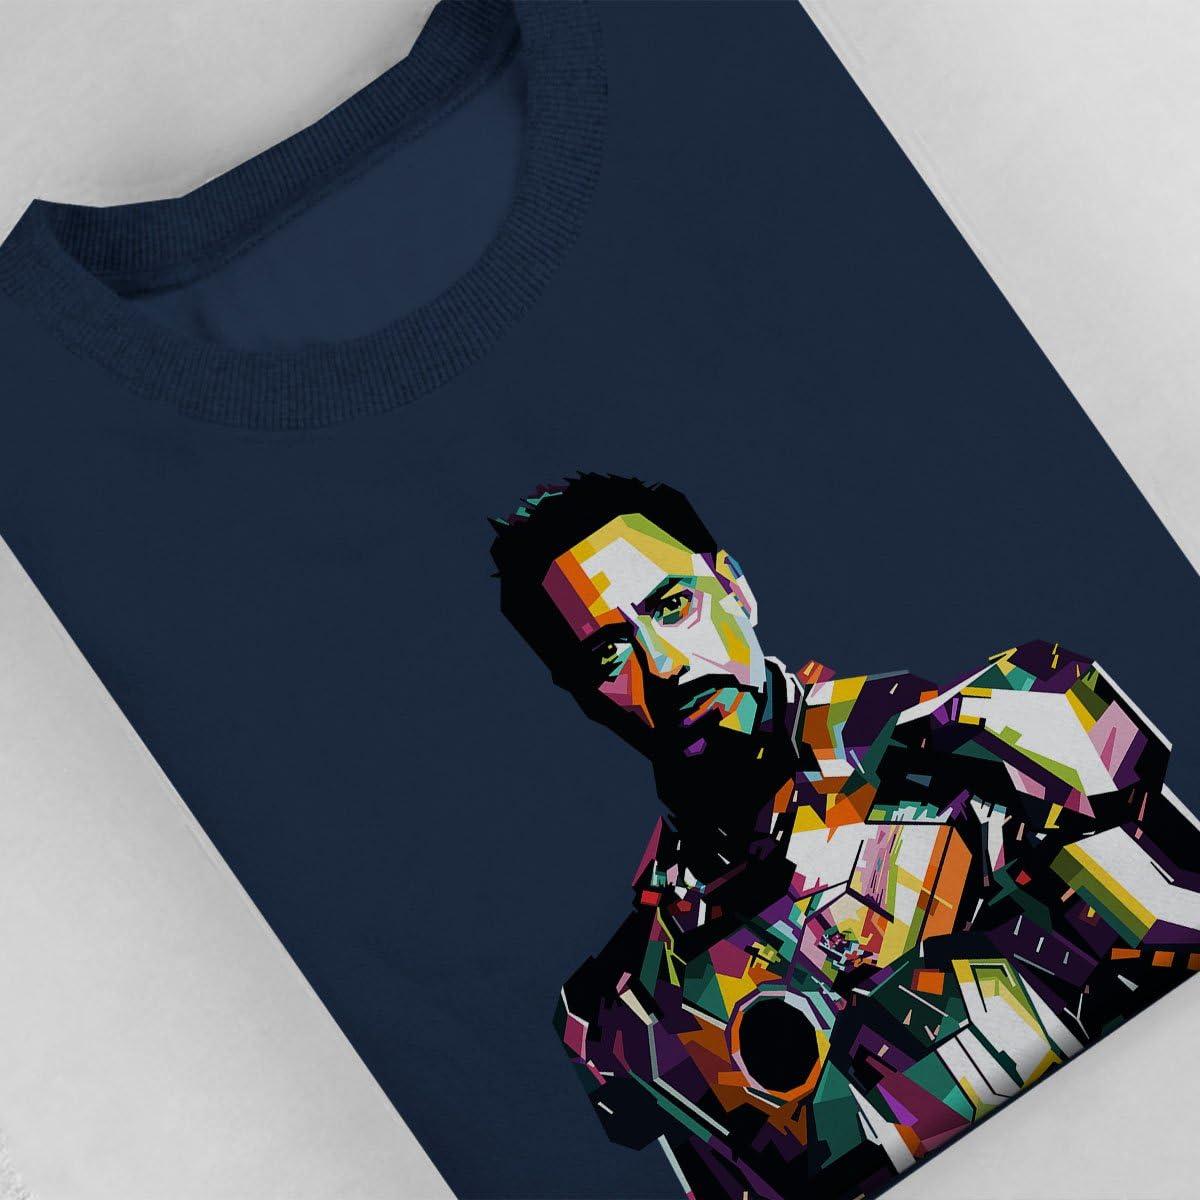 Coto7 Geometric Celebrity Robert Downey Jr Tony Stark Kids Sweatshirt